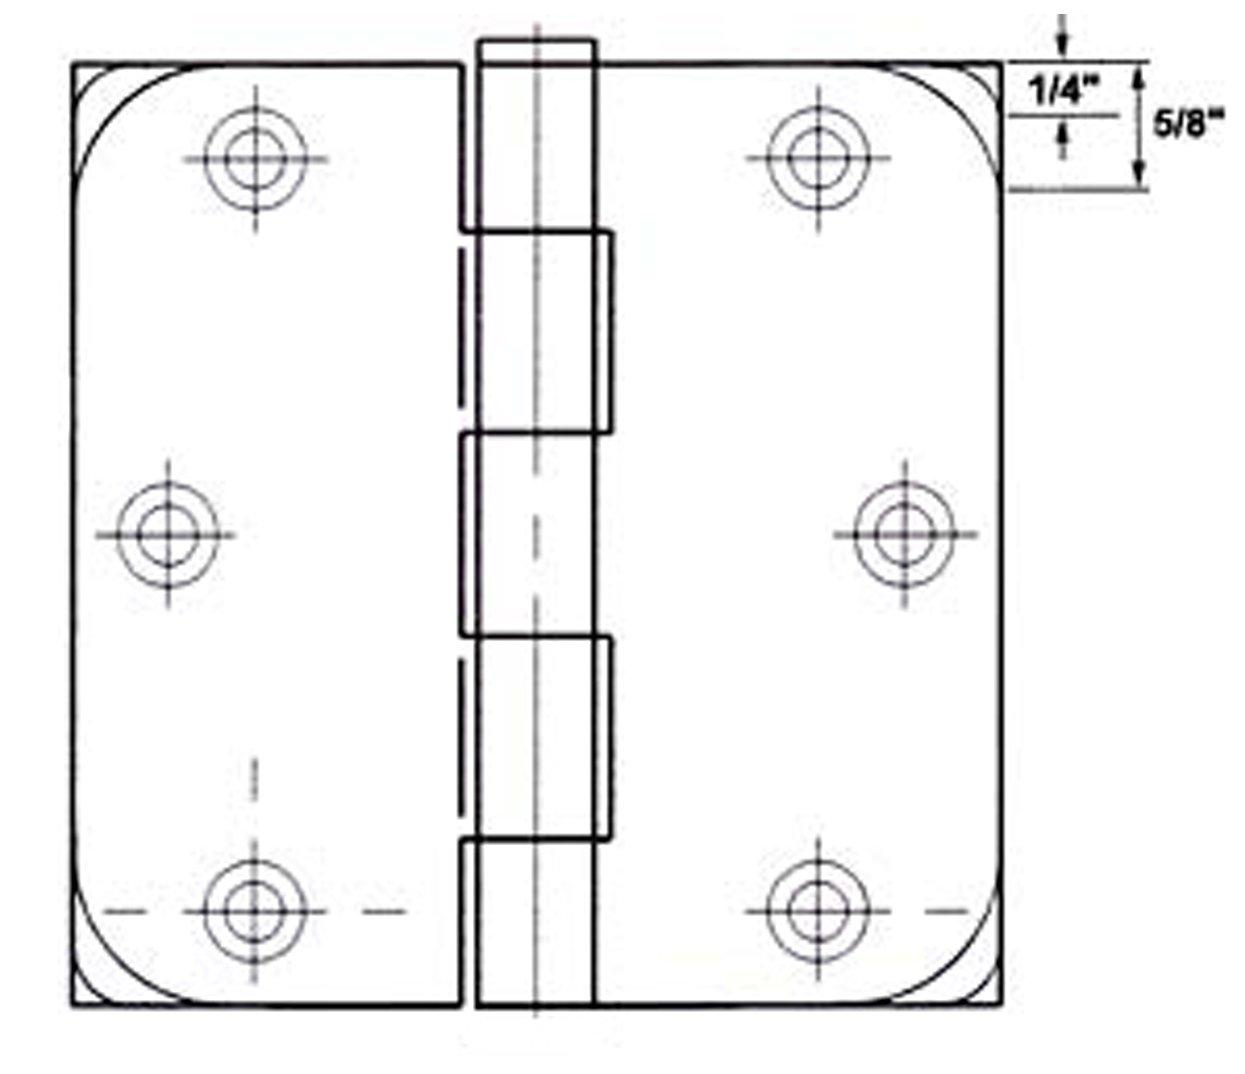 GlideRite Hardware 4 Steel Door Hinges 5//8 Radius and Square Corners Oil Rubbed Bronze Finish 4000-SQ-58-ORB Pack of 12